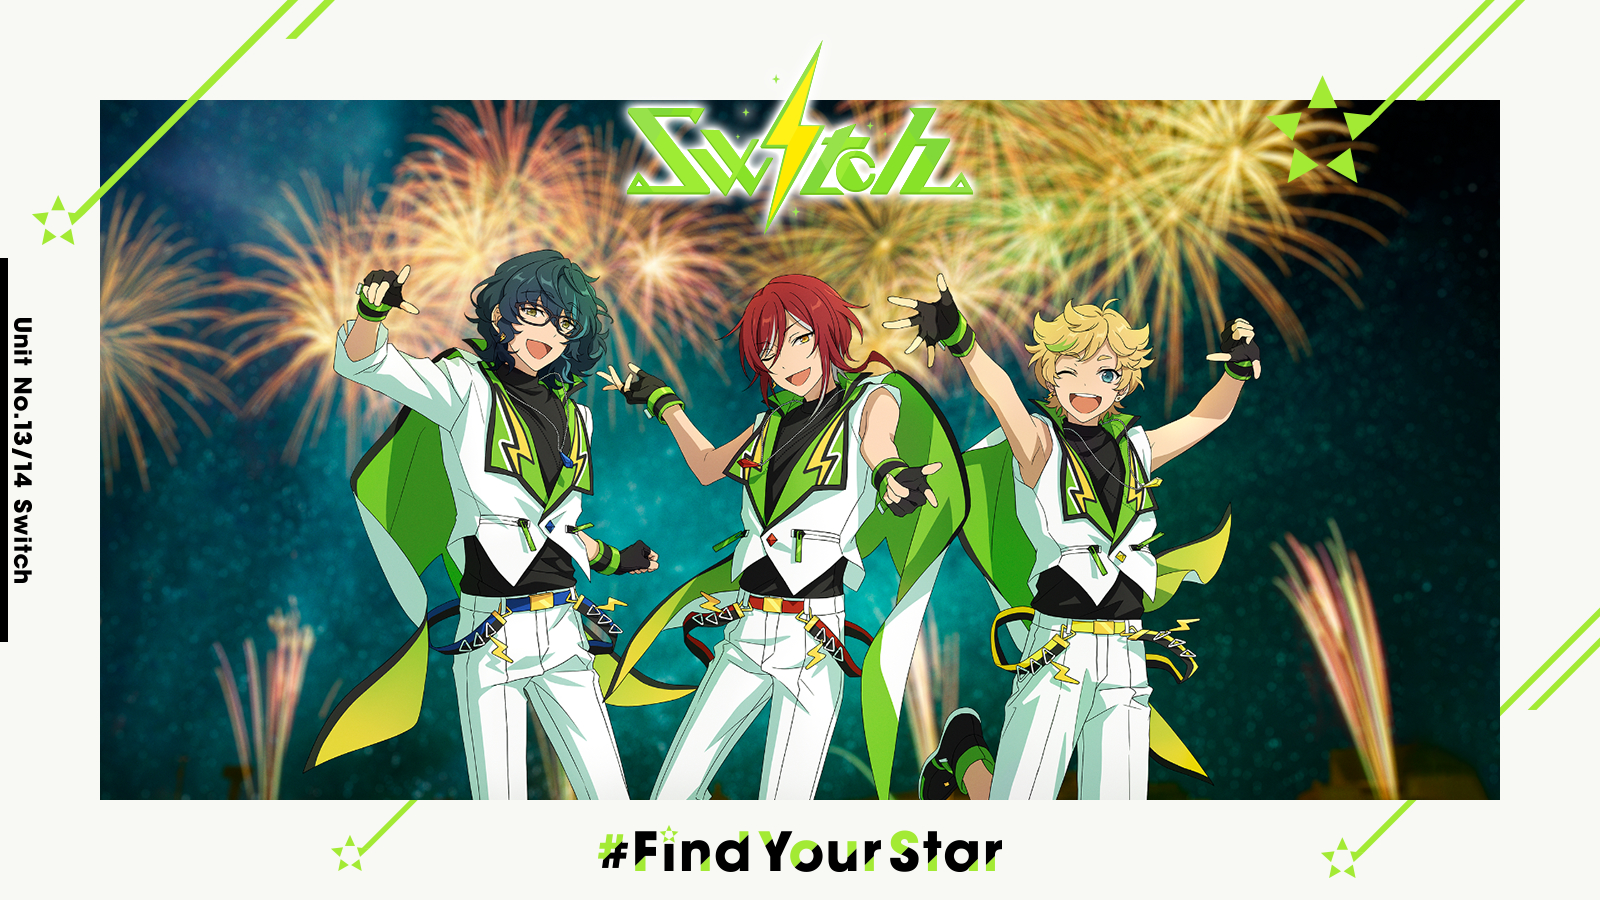 Switch:新潟県 万代シテイパーク (C)2014-2019 Happy Elements K.K